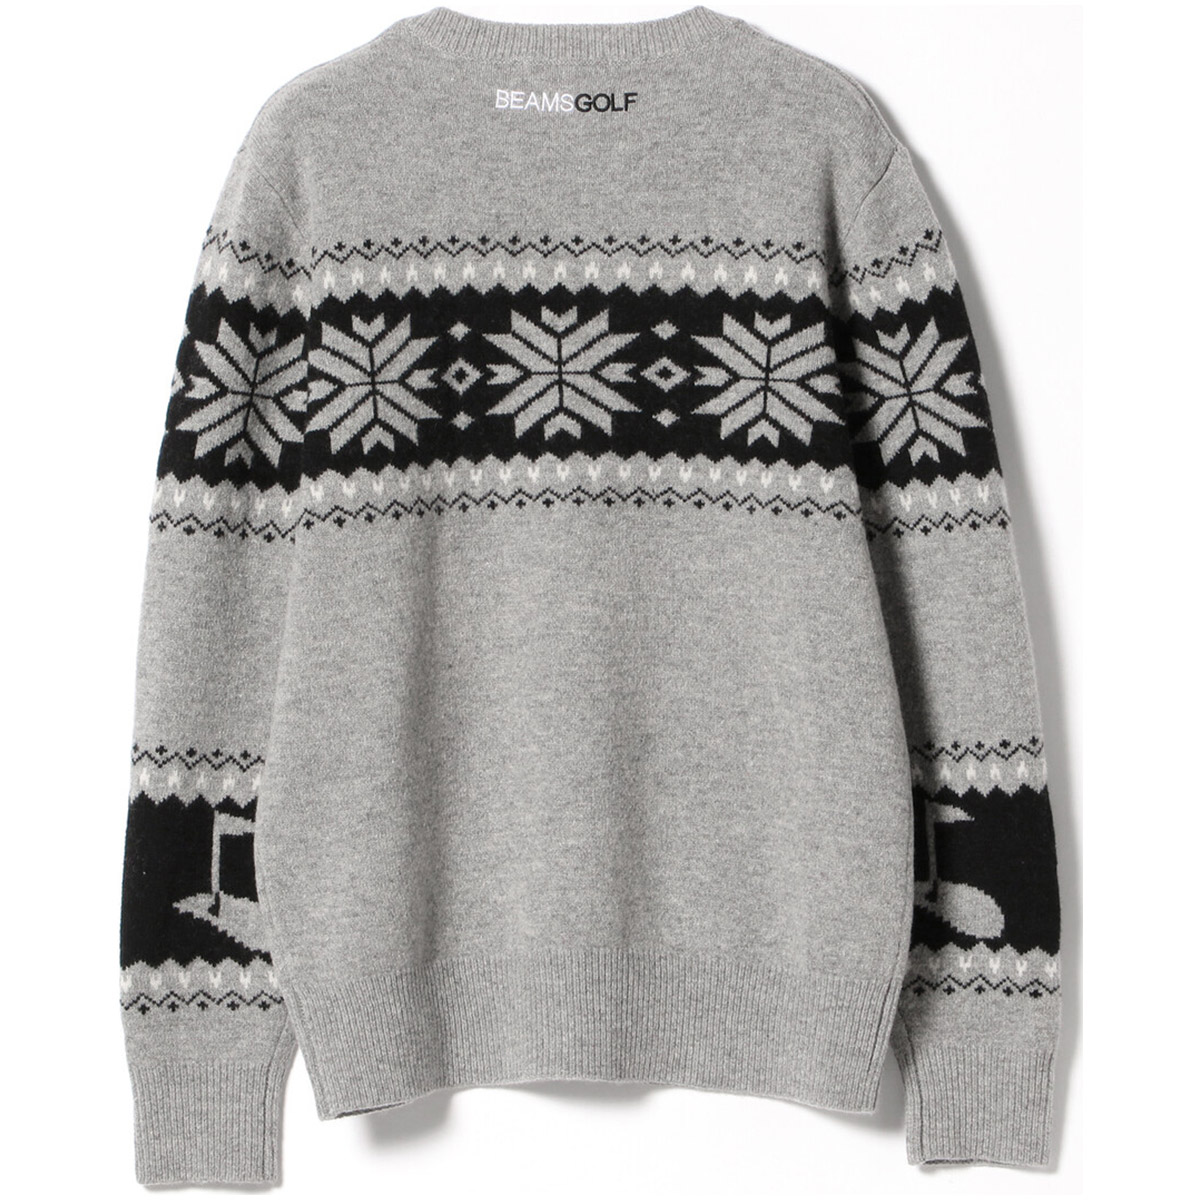 BEAMS GOLF ORANGE LABEL ノルディック セーター